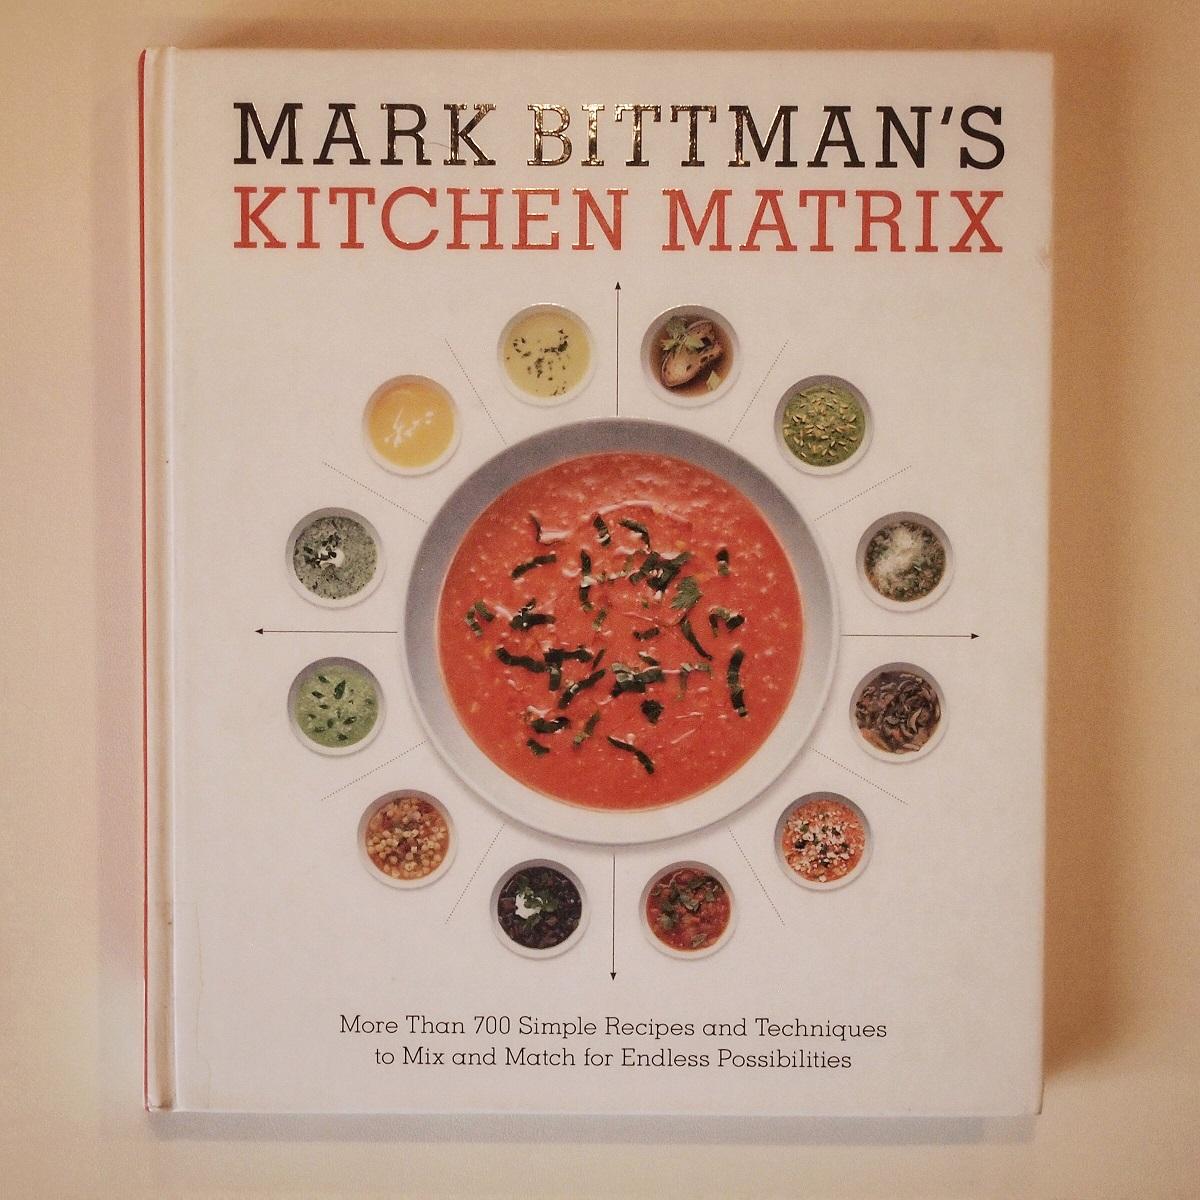 Kitchen Matrix by Mark Bittman